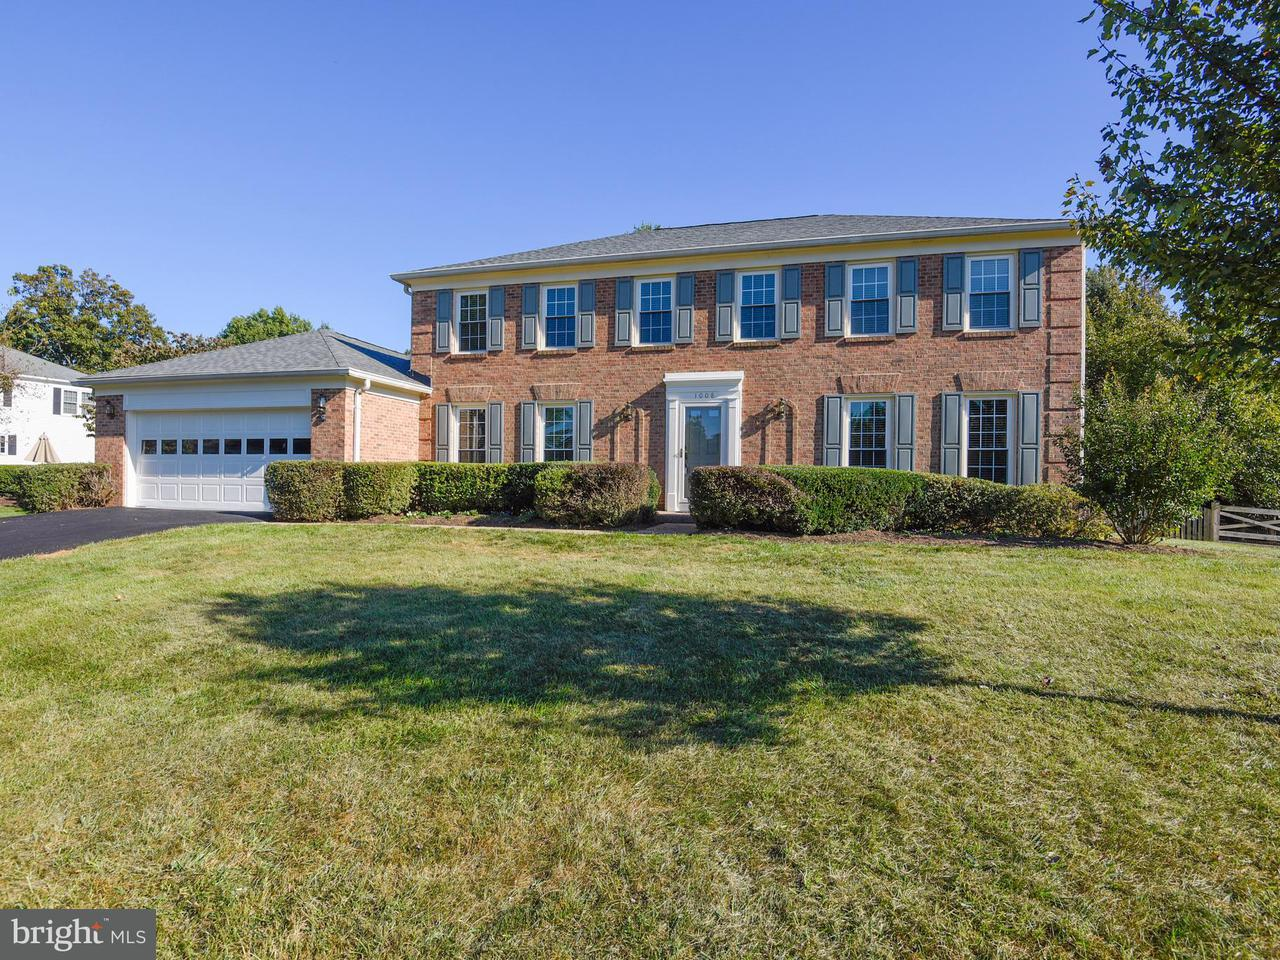 Single Family Home for Sale at 1008 RIVA RIDGE Drive 1008 RIVA RIDGE Drive Great Falls, Virginia 22066 United States